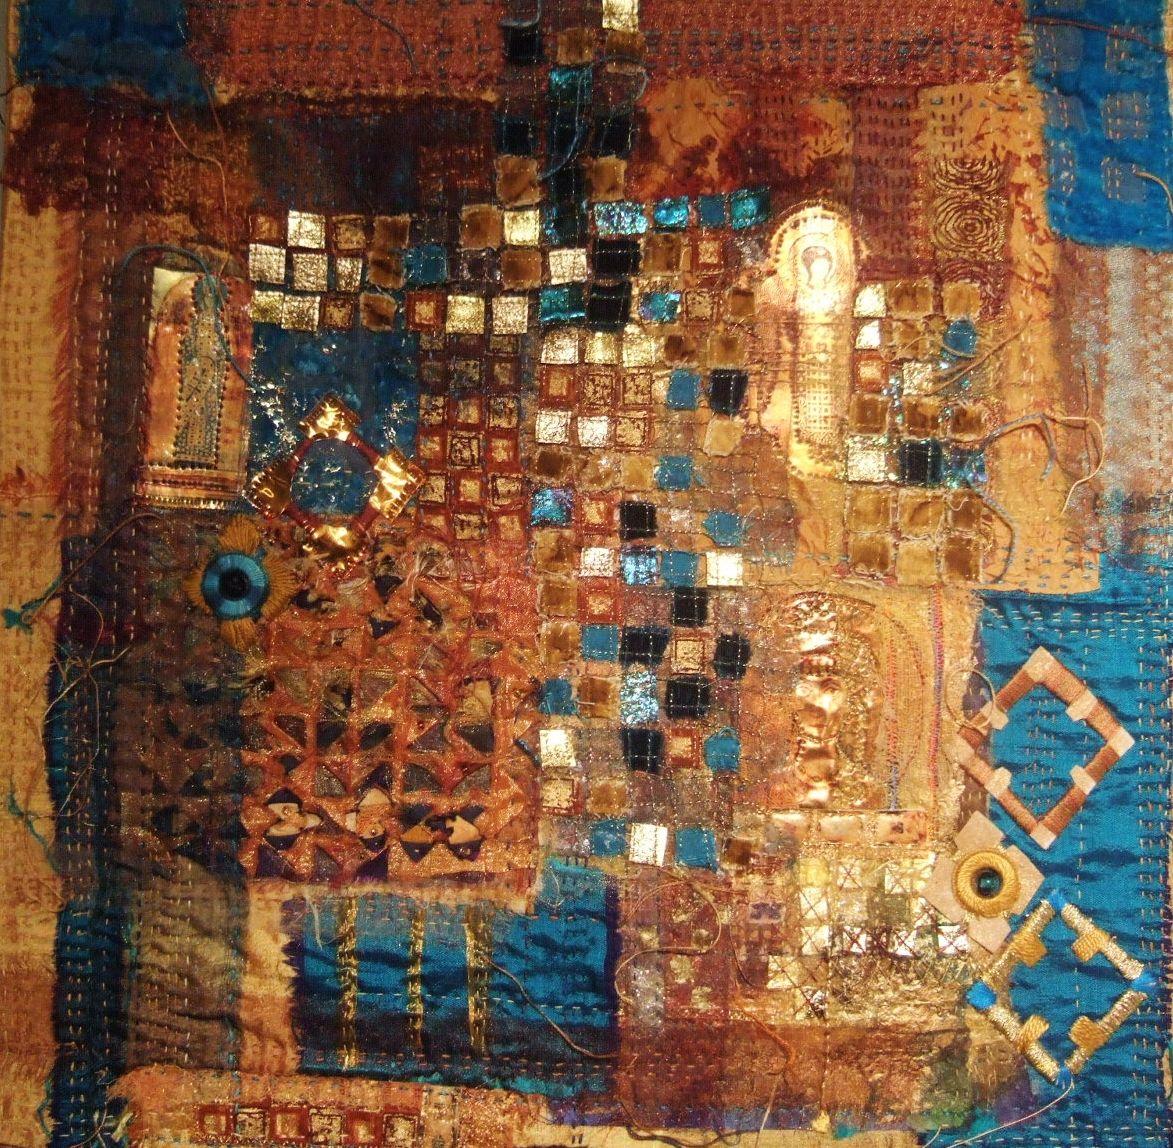 Hand and machine embroidery based on Byzantine mosaics